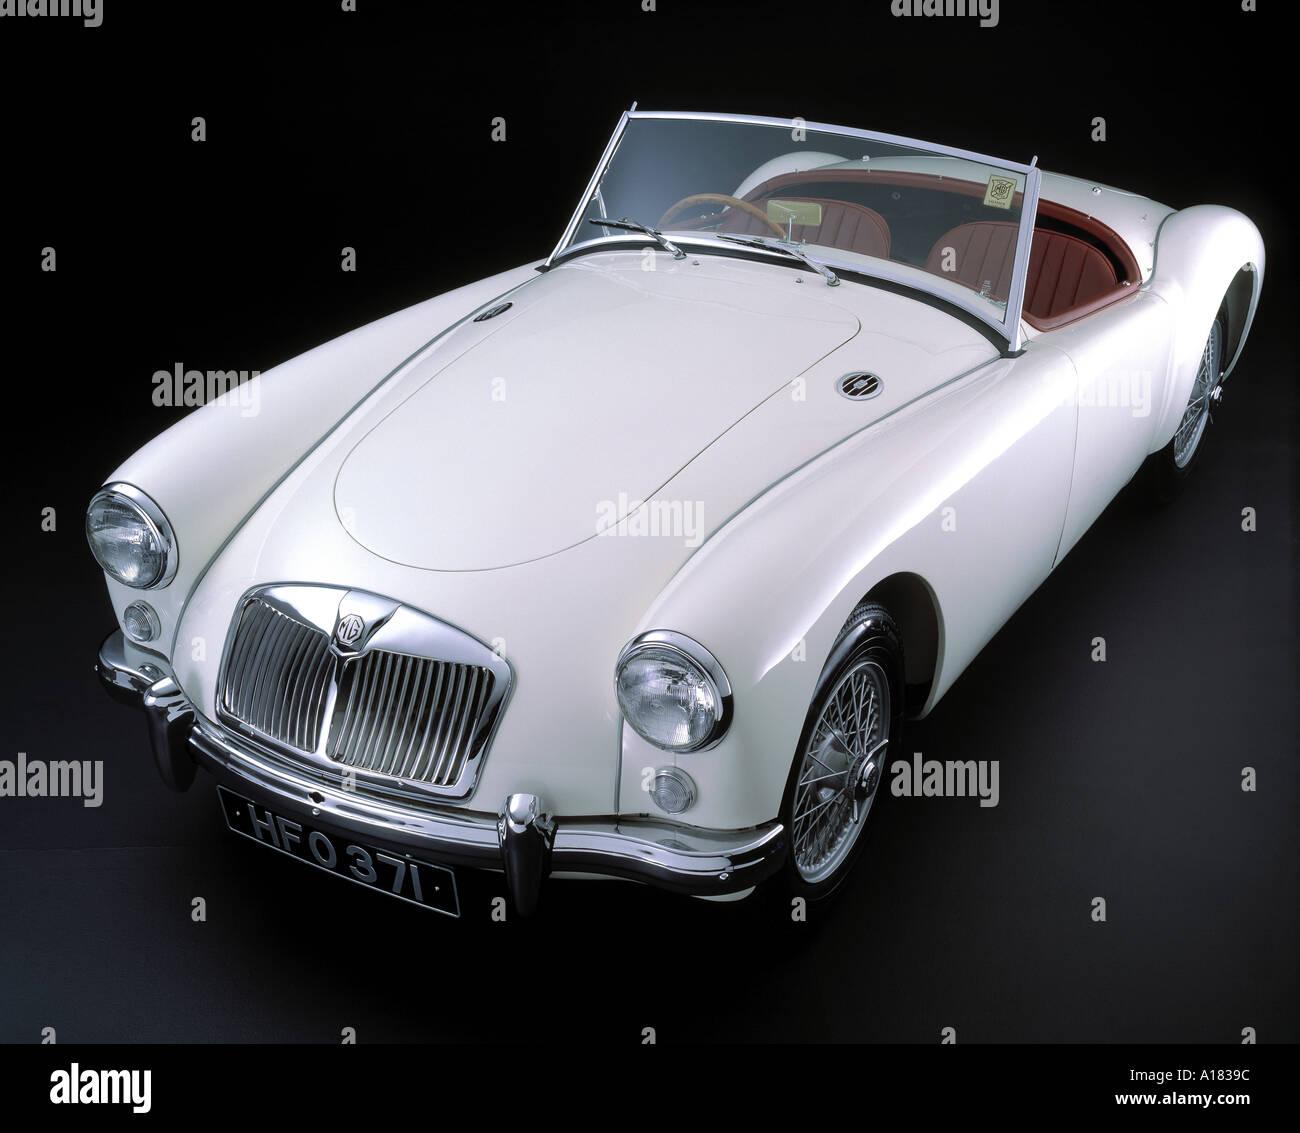 1956 MG A 1500 - Stock Image